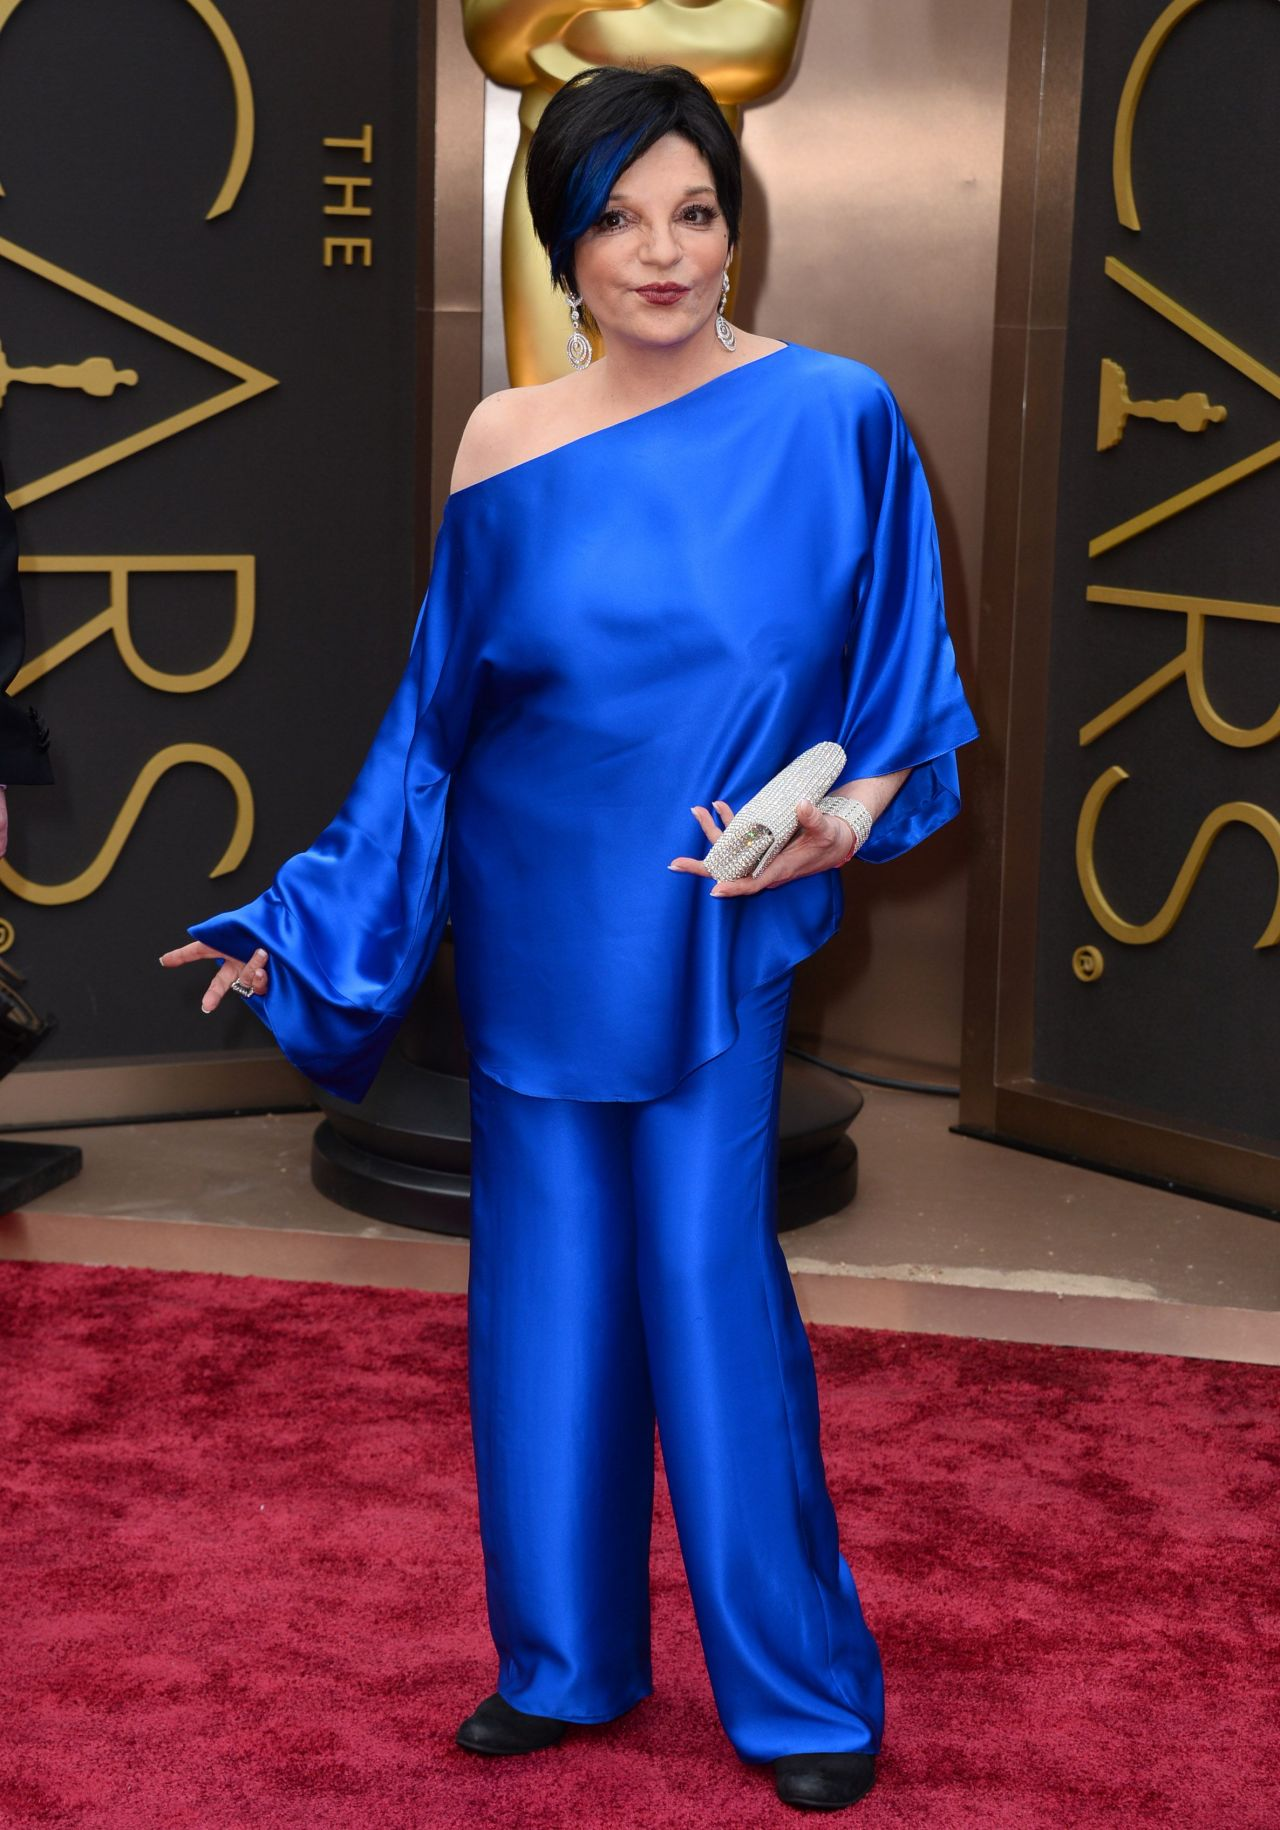 Liza Minnelli in a Cobalt Blue Pantsuit - 2014 Oscars